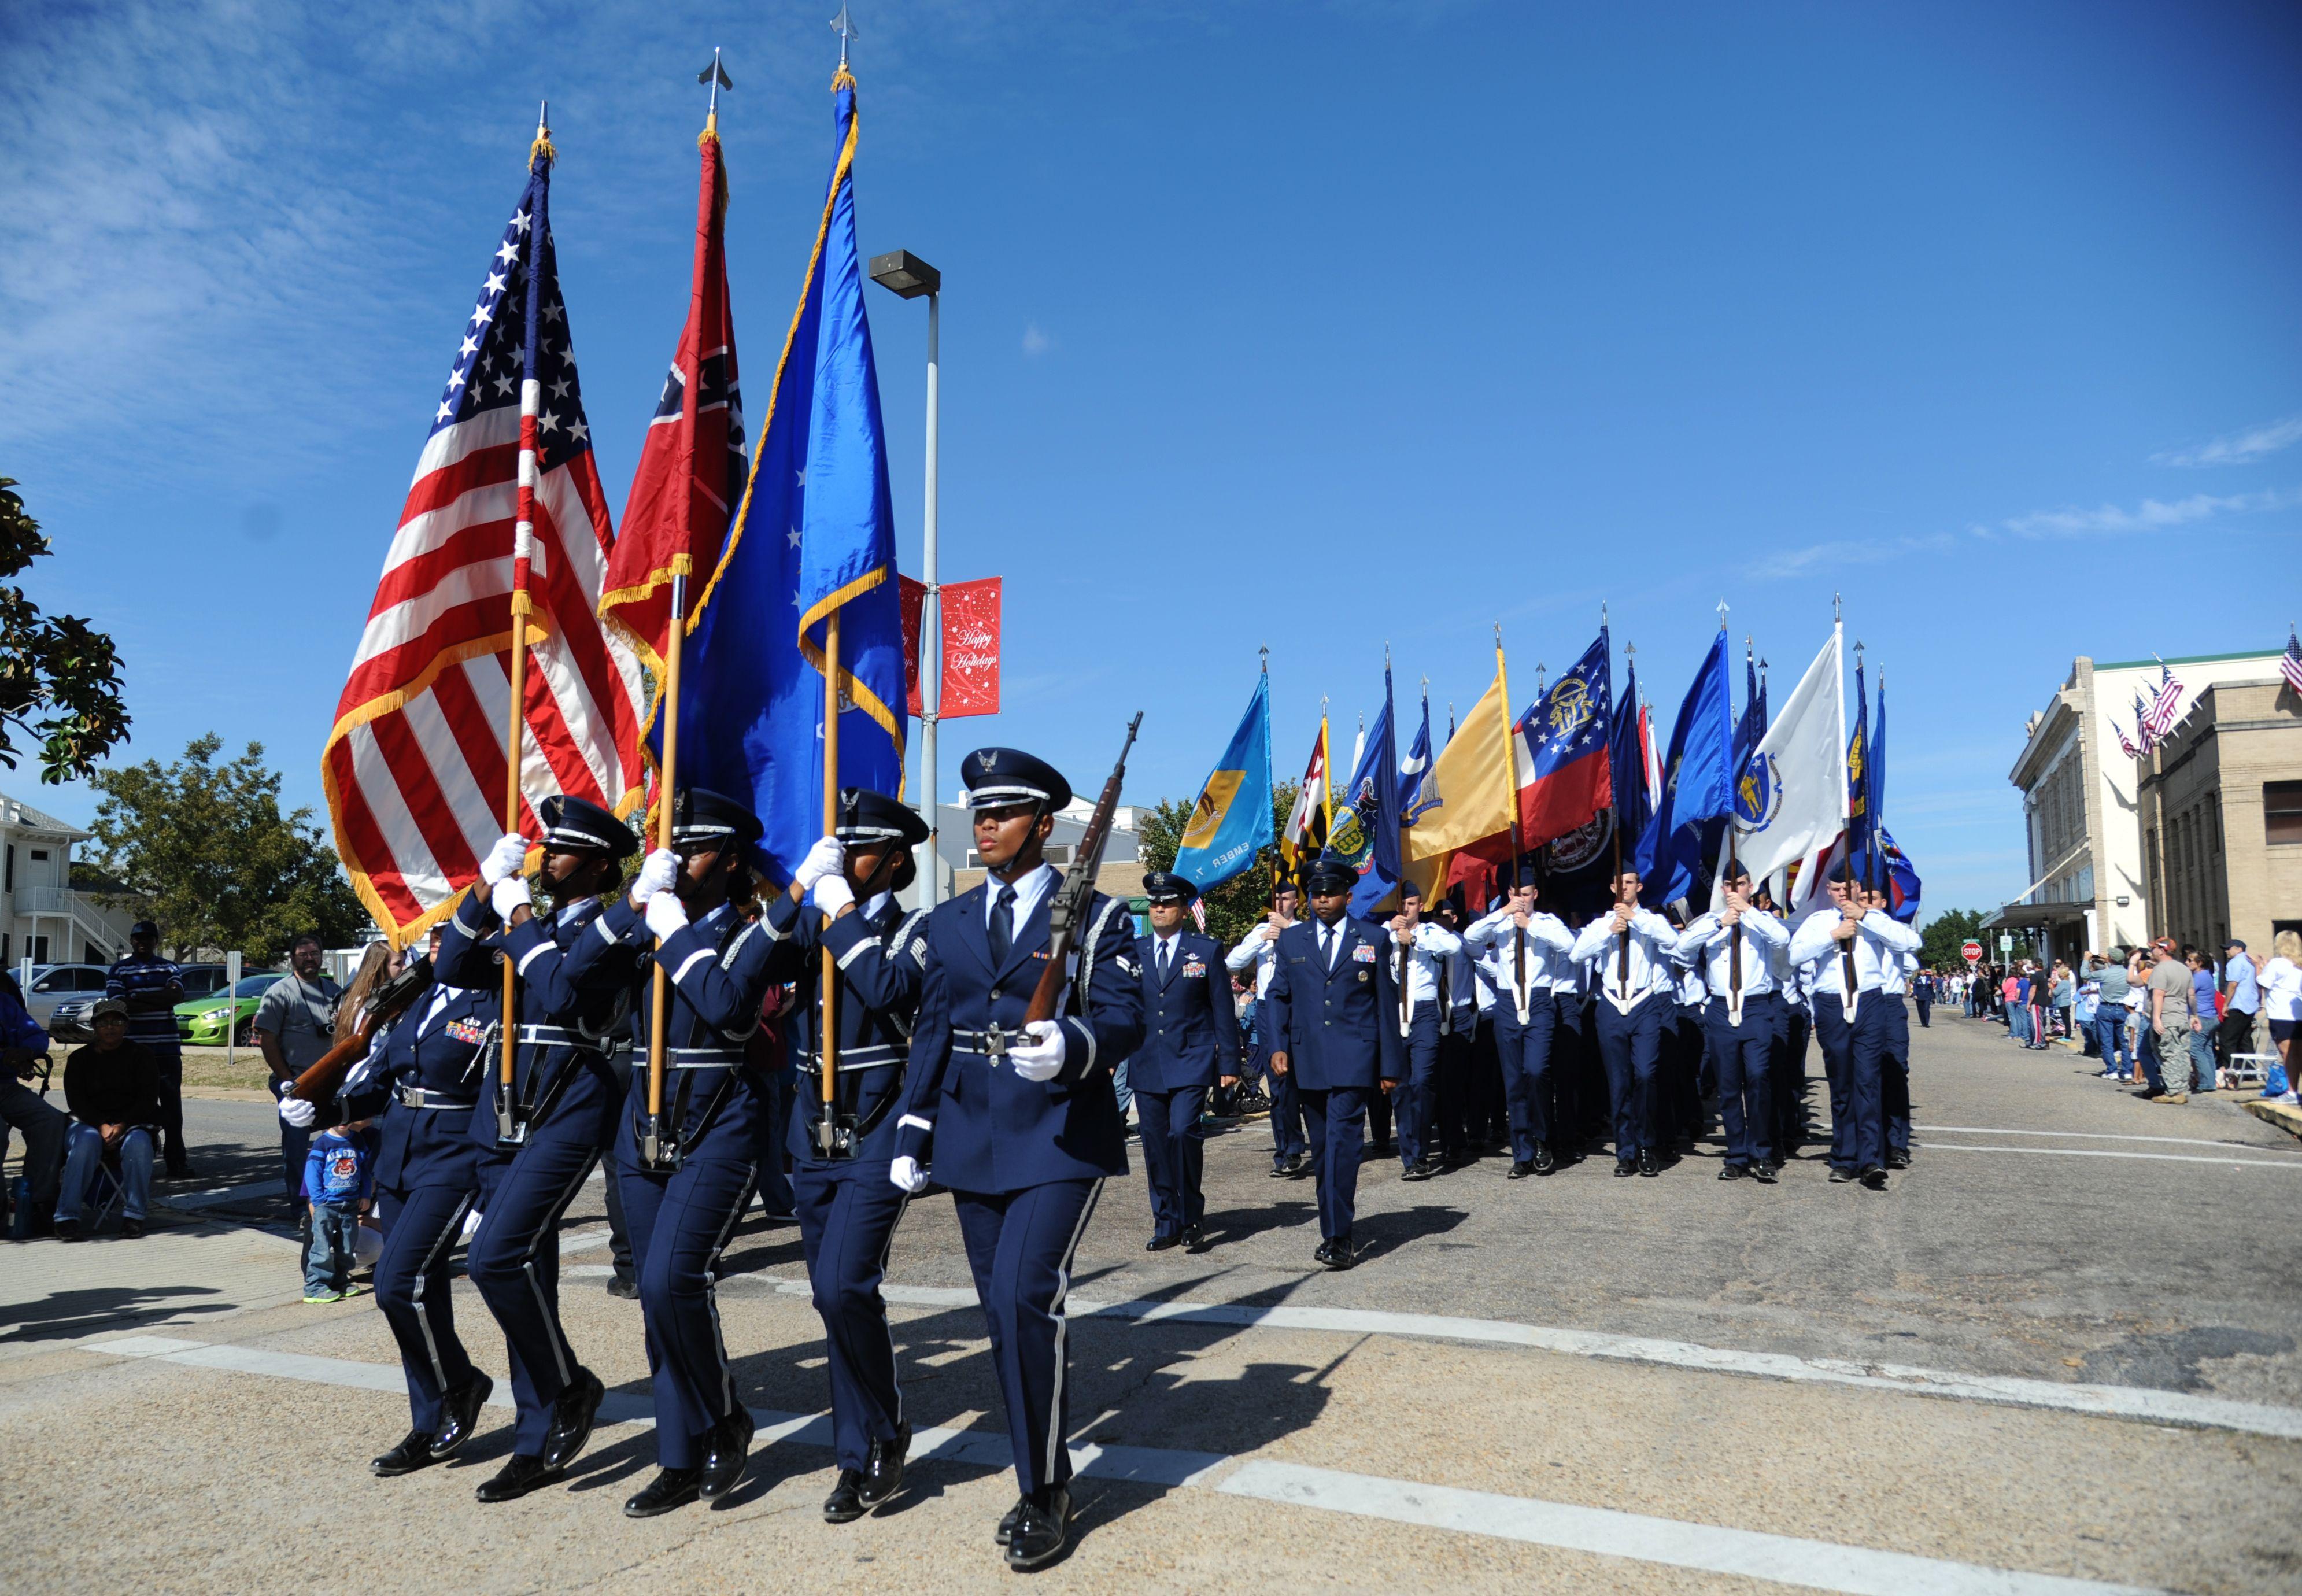 Veterans Day parade in Biloxi, Mississippi.